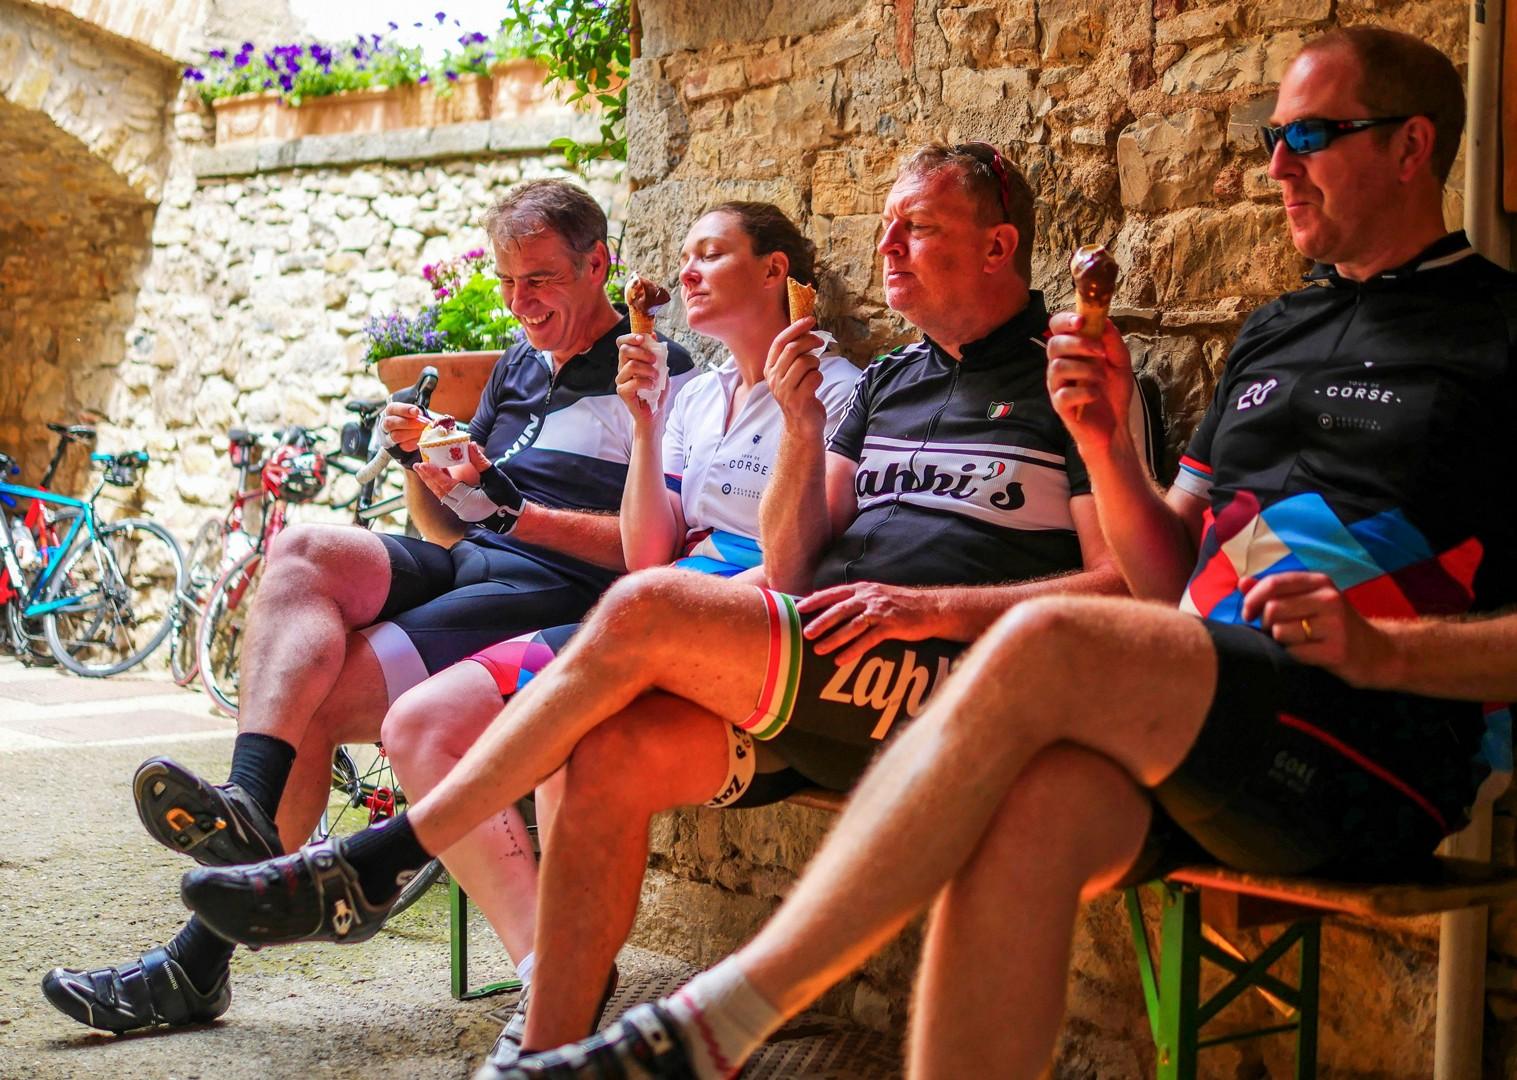 Team gelato.jpg - Italy - Tuscany - Giro della Toscana - Guided Road Cycling Holiday - Road Cycling